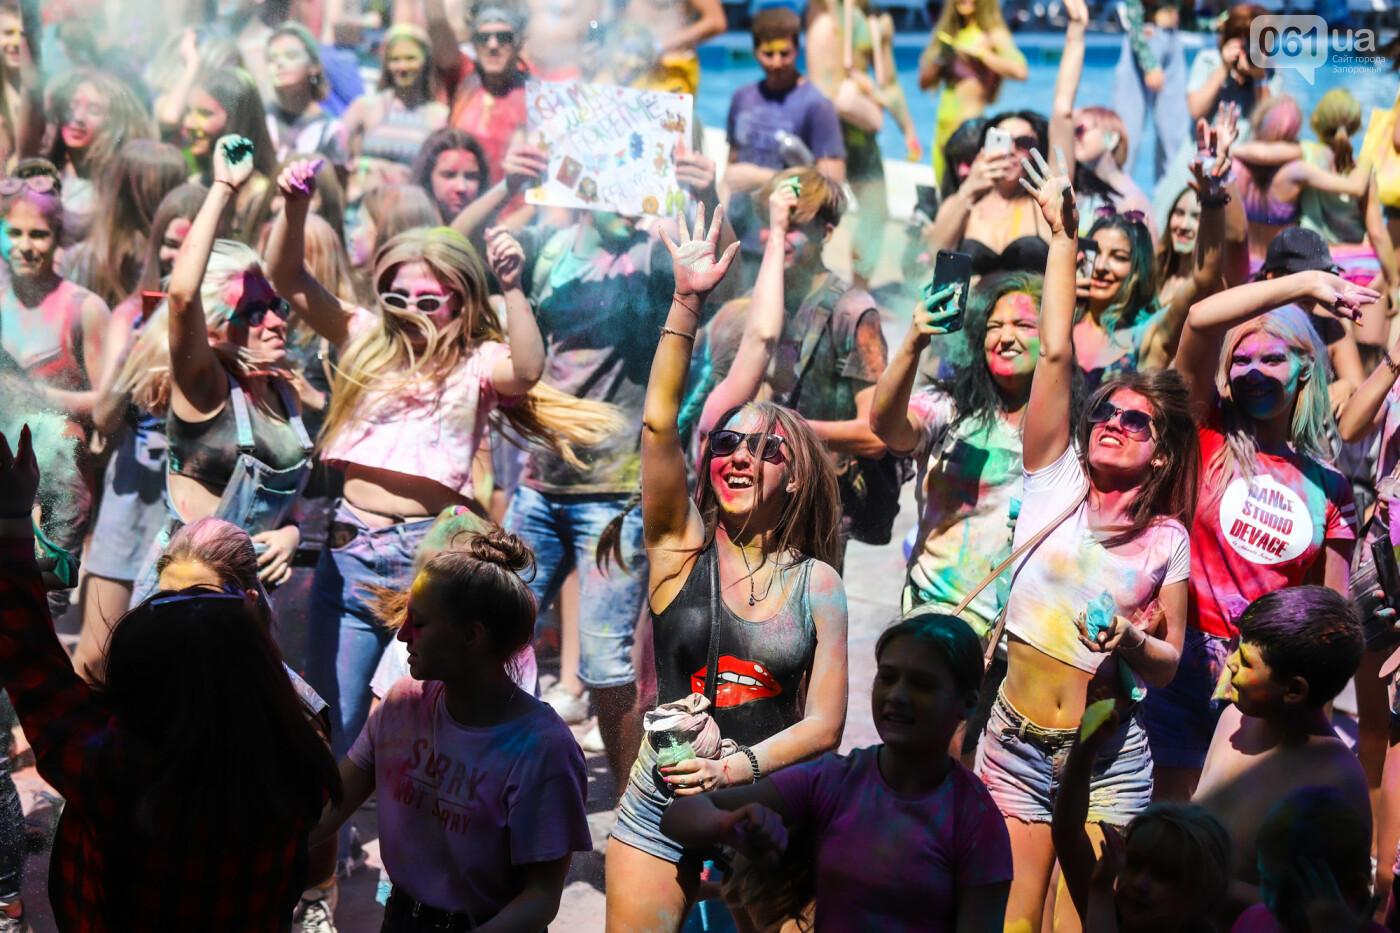 Сотни запорожцев приняли участие в фестивале красок Холи, - ФОТОРЕПОРТАЖ, фото-22